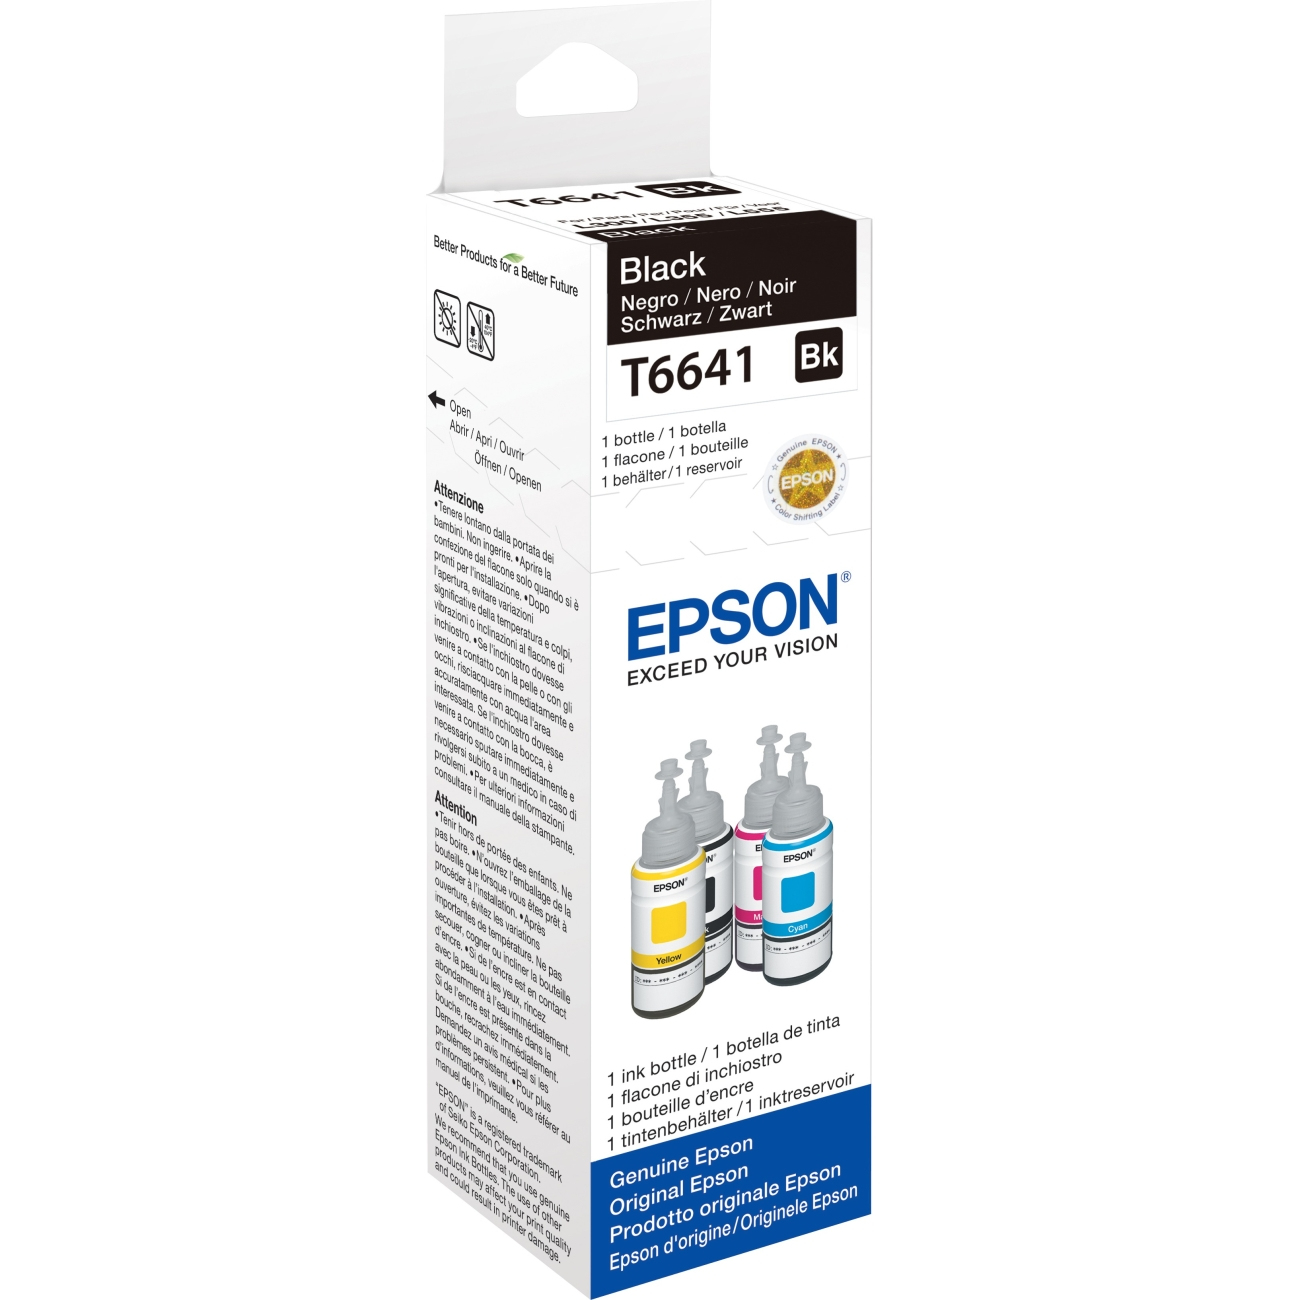 Epson T6641 - 70 ml - black - ink refill - for EcoTank ET-14000, 2500, 2550, 4500, L475, L565, L575, Expre